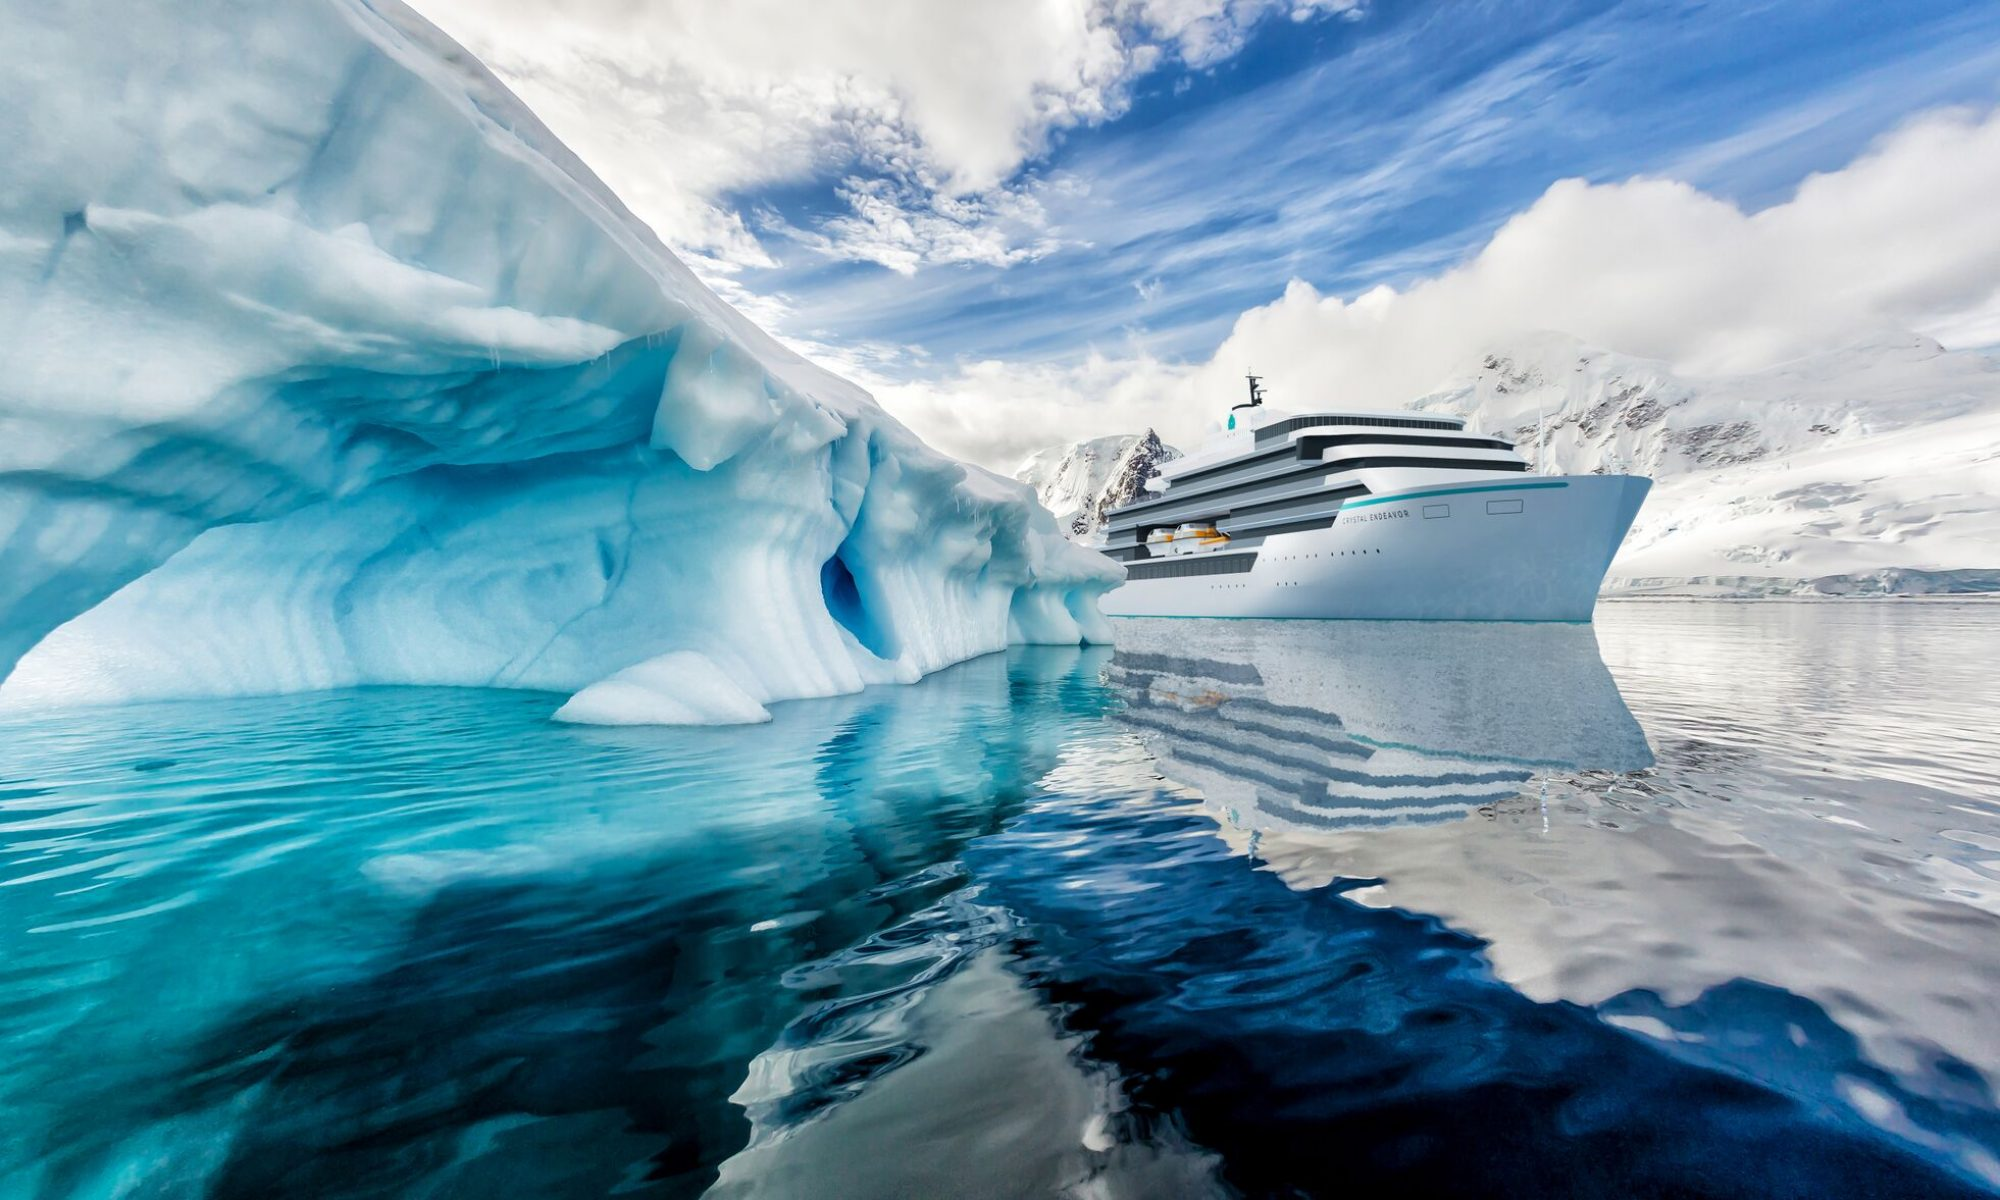 Expeditions in Antarctica